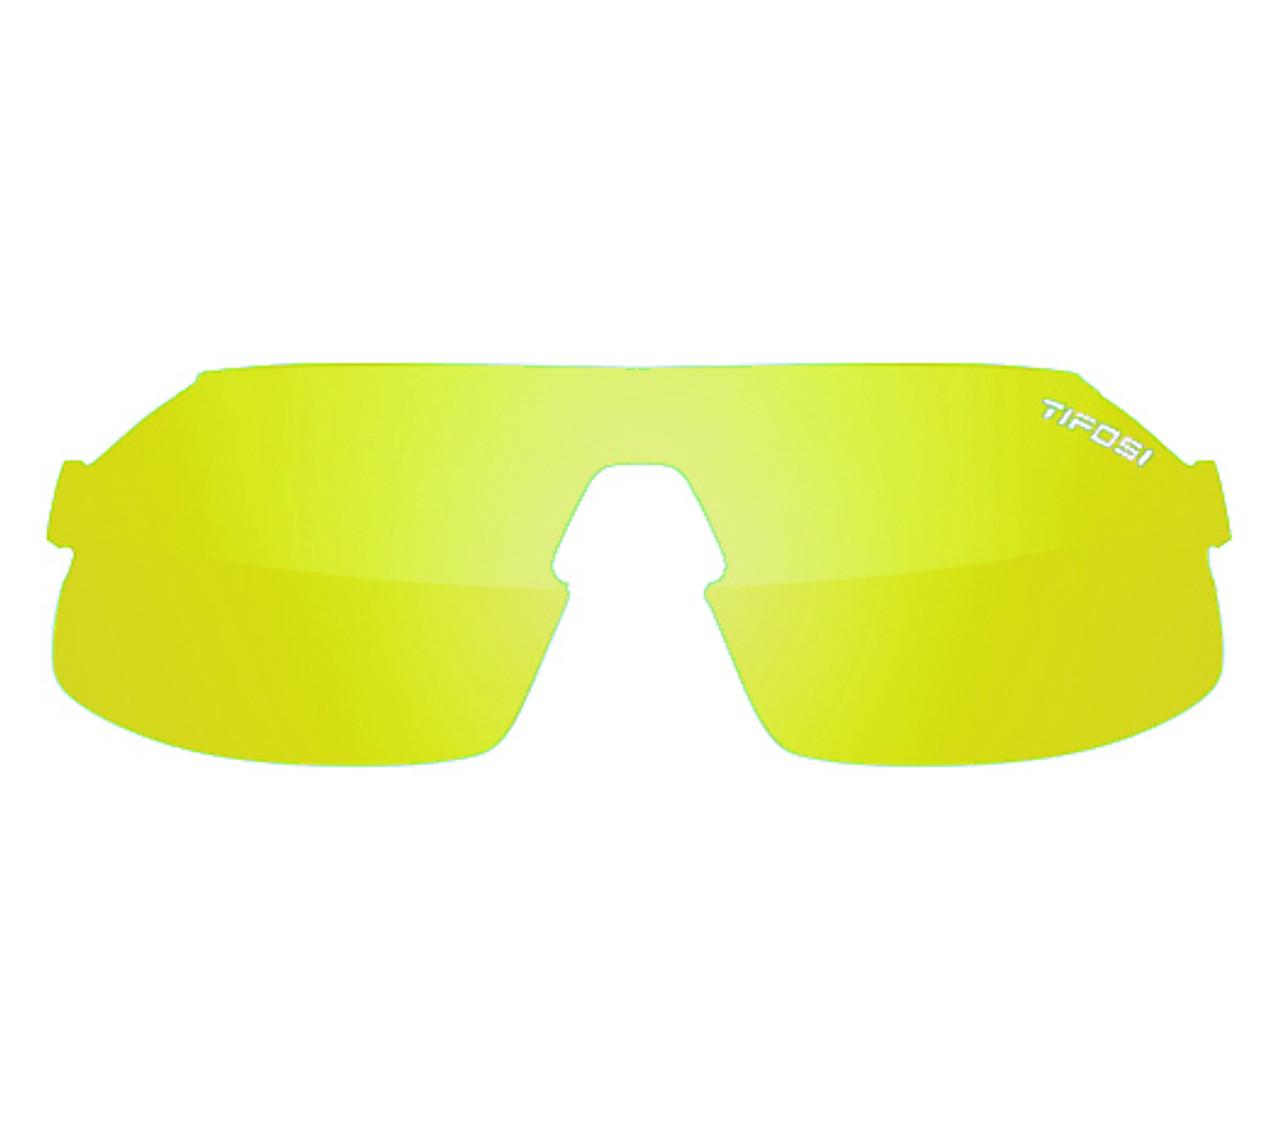 Clarion Yellow